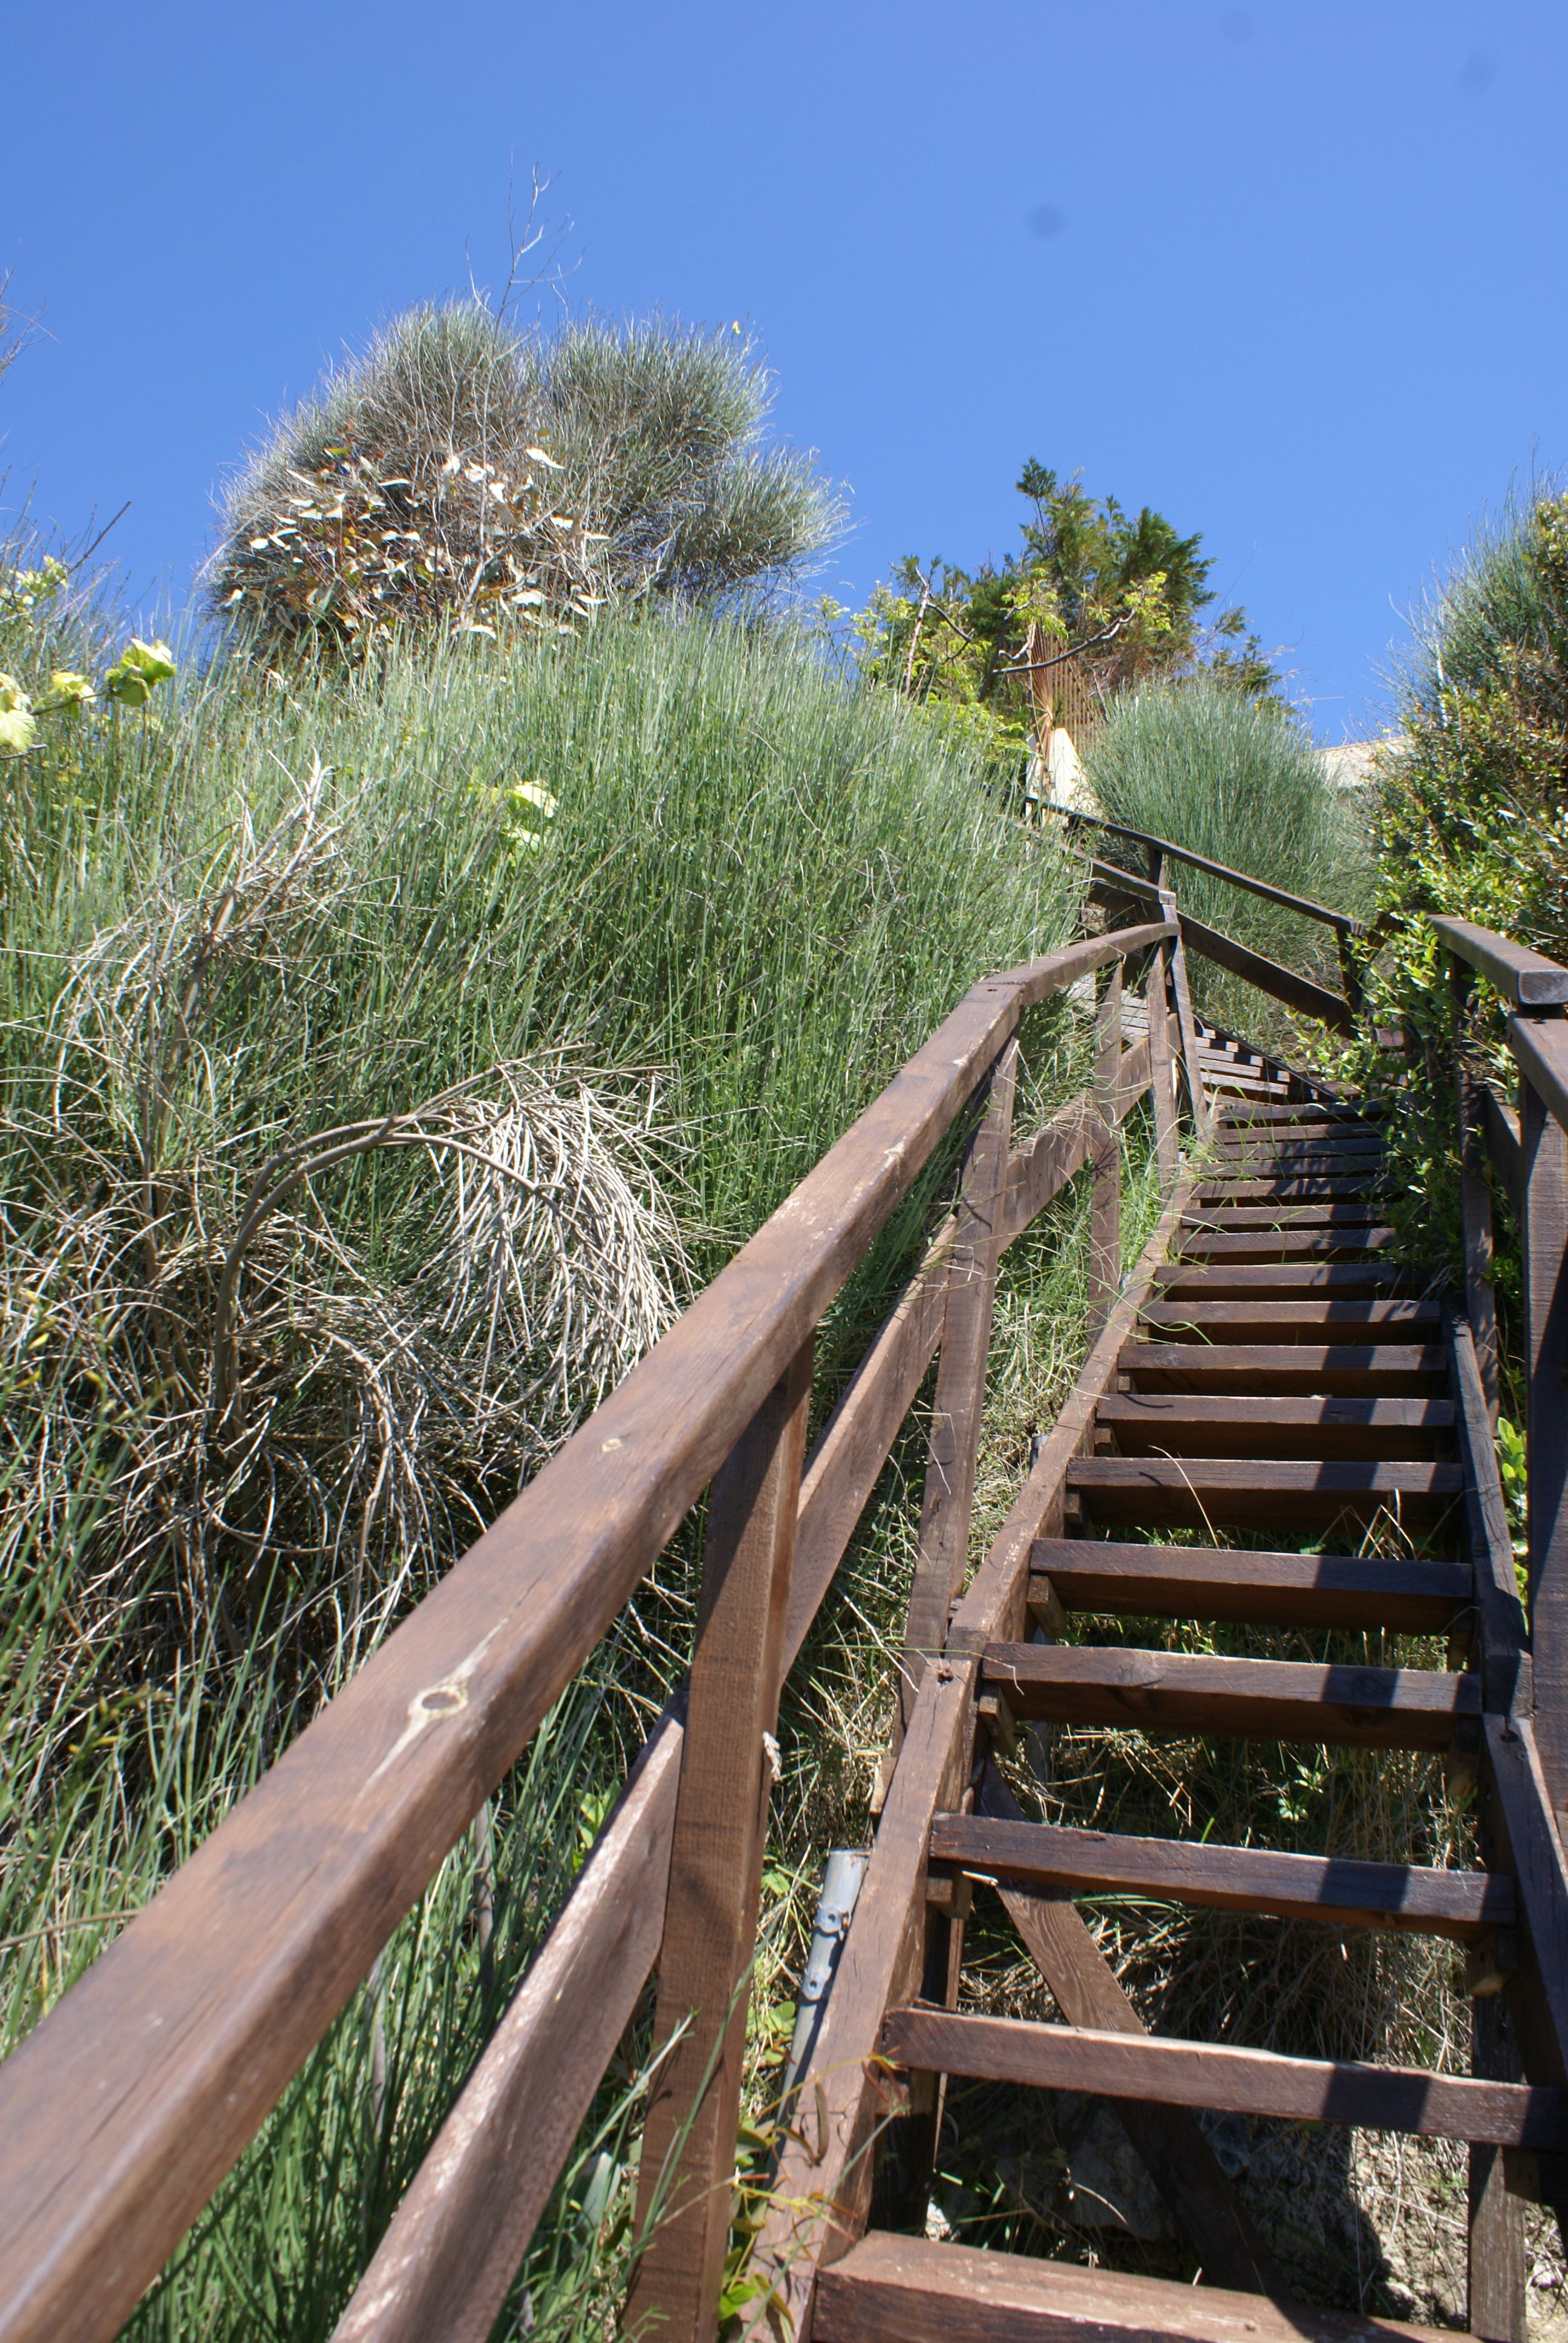 Treppenaufgang vom Strand - Korfu Strandvilla Meliti, Kanouli, Agios Matheos, Korfu, KorfuCorfu